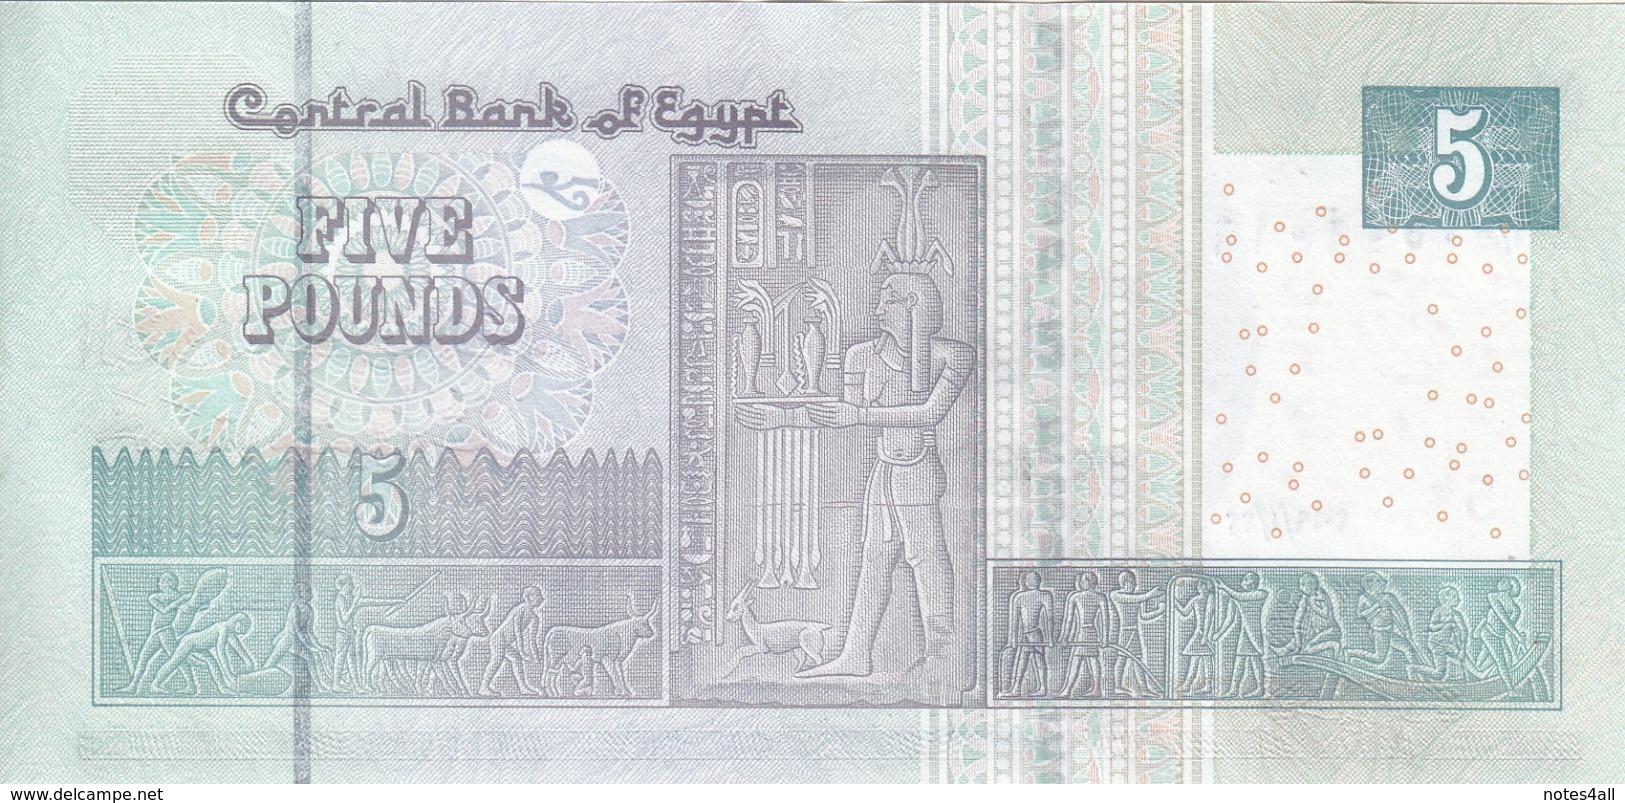 EGYPT 5 POUNDS EGP 2019 P-70b SIG/ T.AMER #24 UNC */* - Egypt